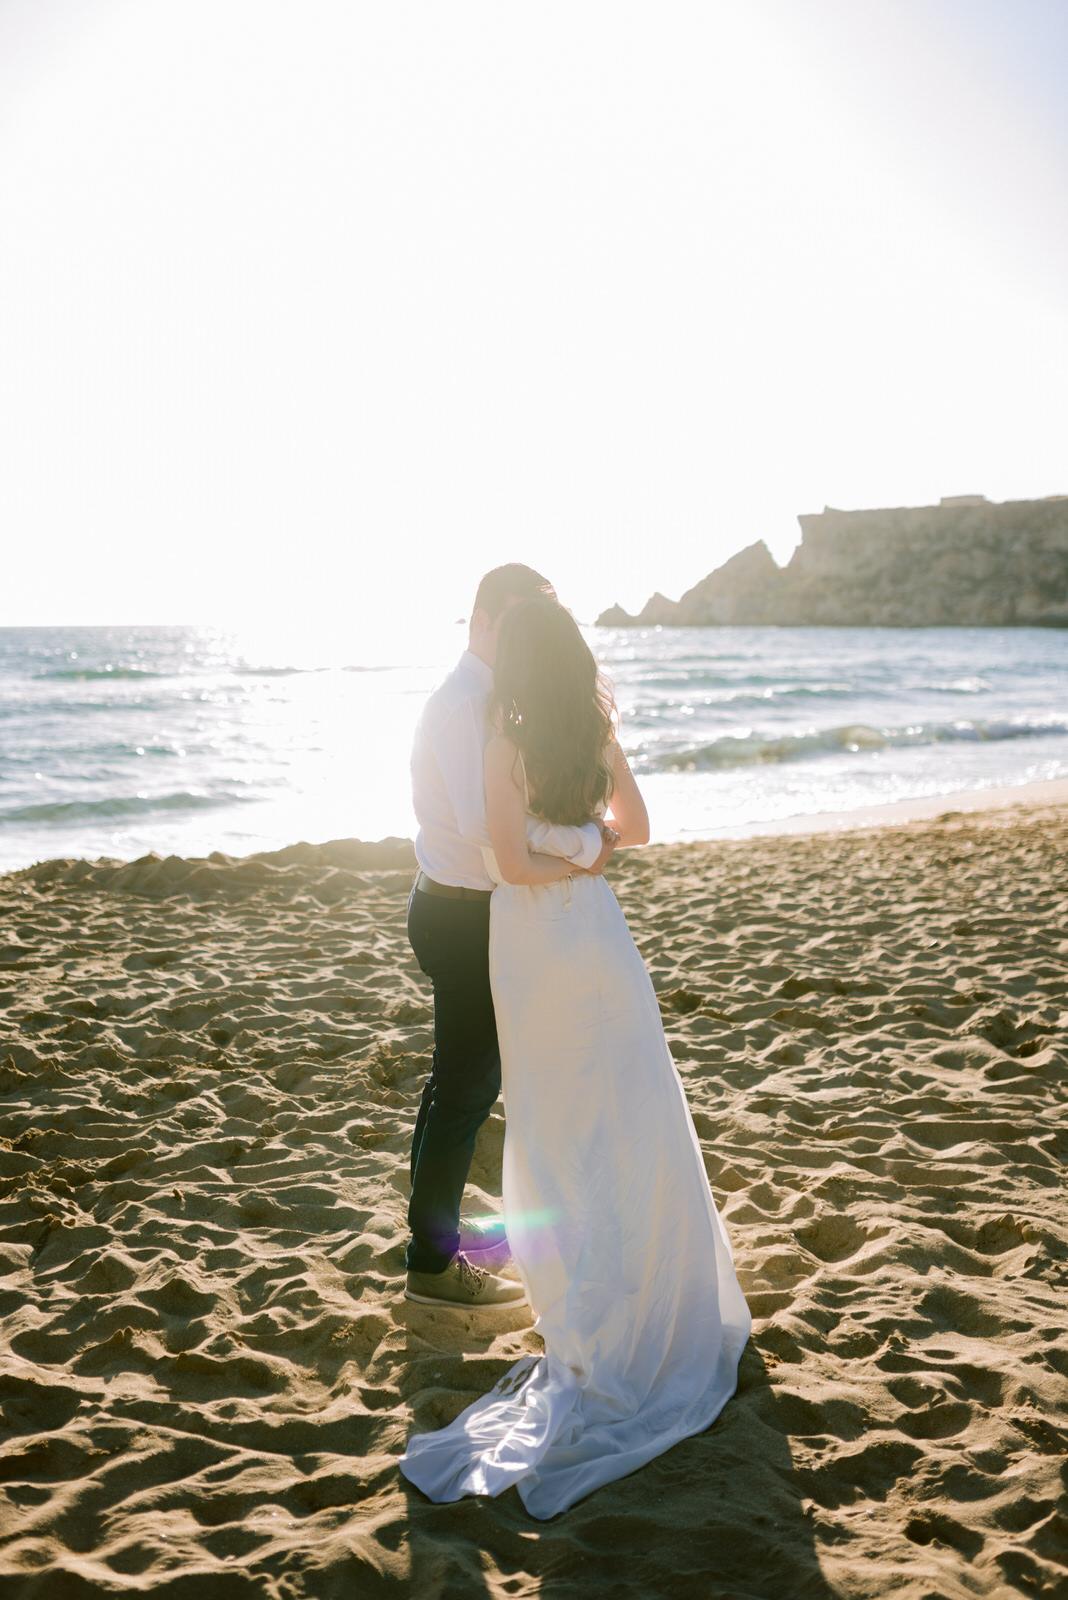 mdina wedding, malta wedding photography, malta elopement, golden bay malta wedding photos, wedding photographer malta, malta wedding venue, villa bologna wedding (87).jpg